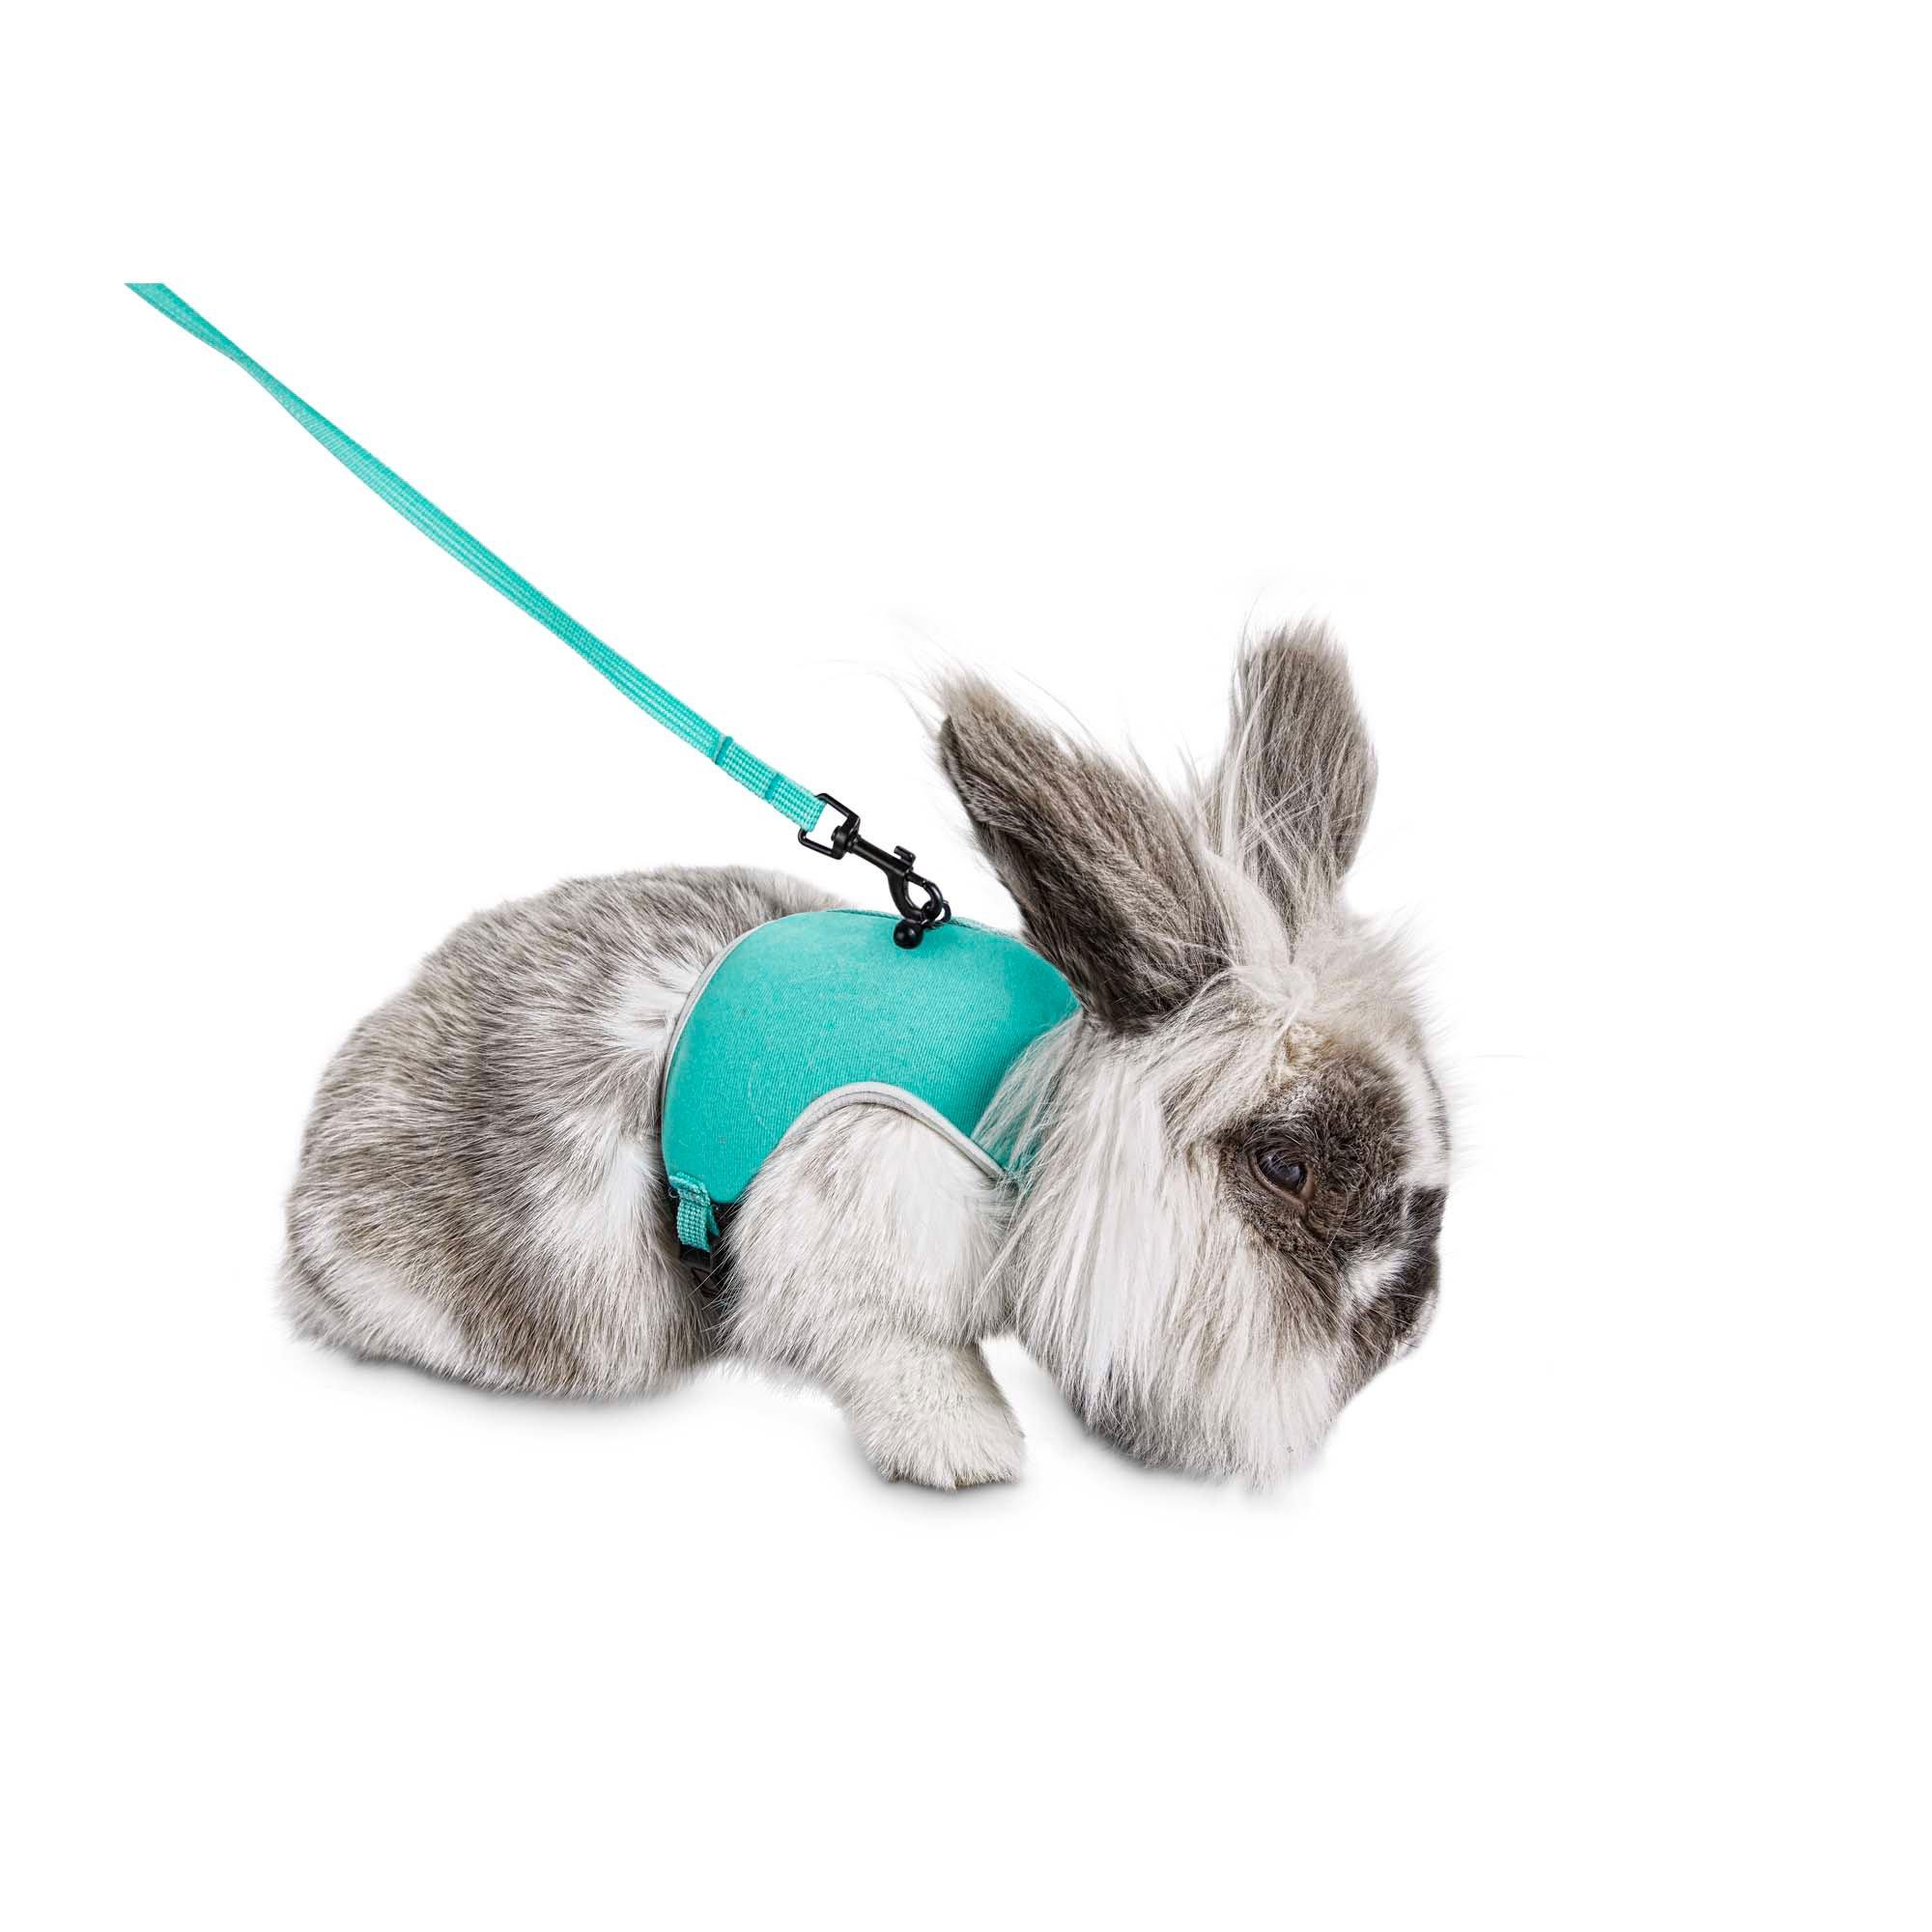 hight resolution of you me aqua small animal harness and leash set petco rh petco com bunny harness petco bunny harness petco